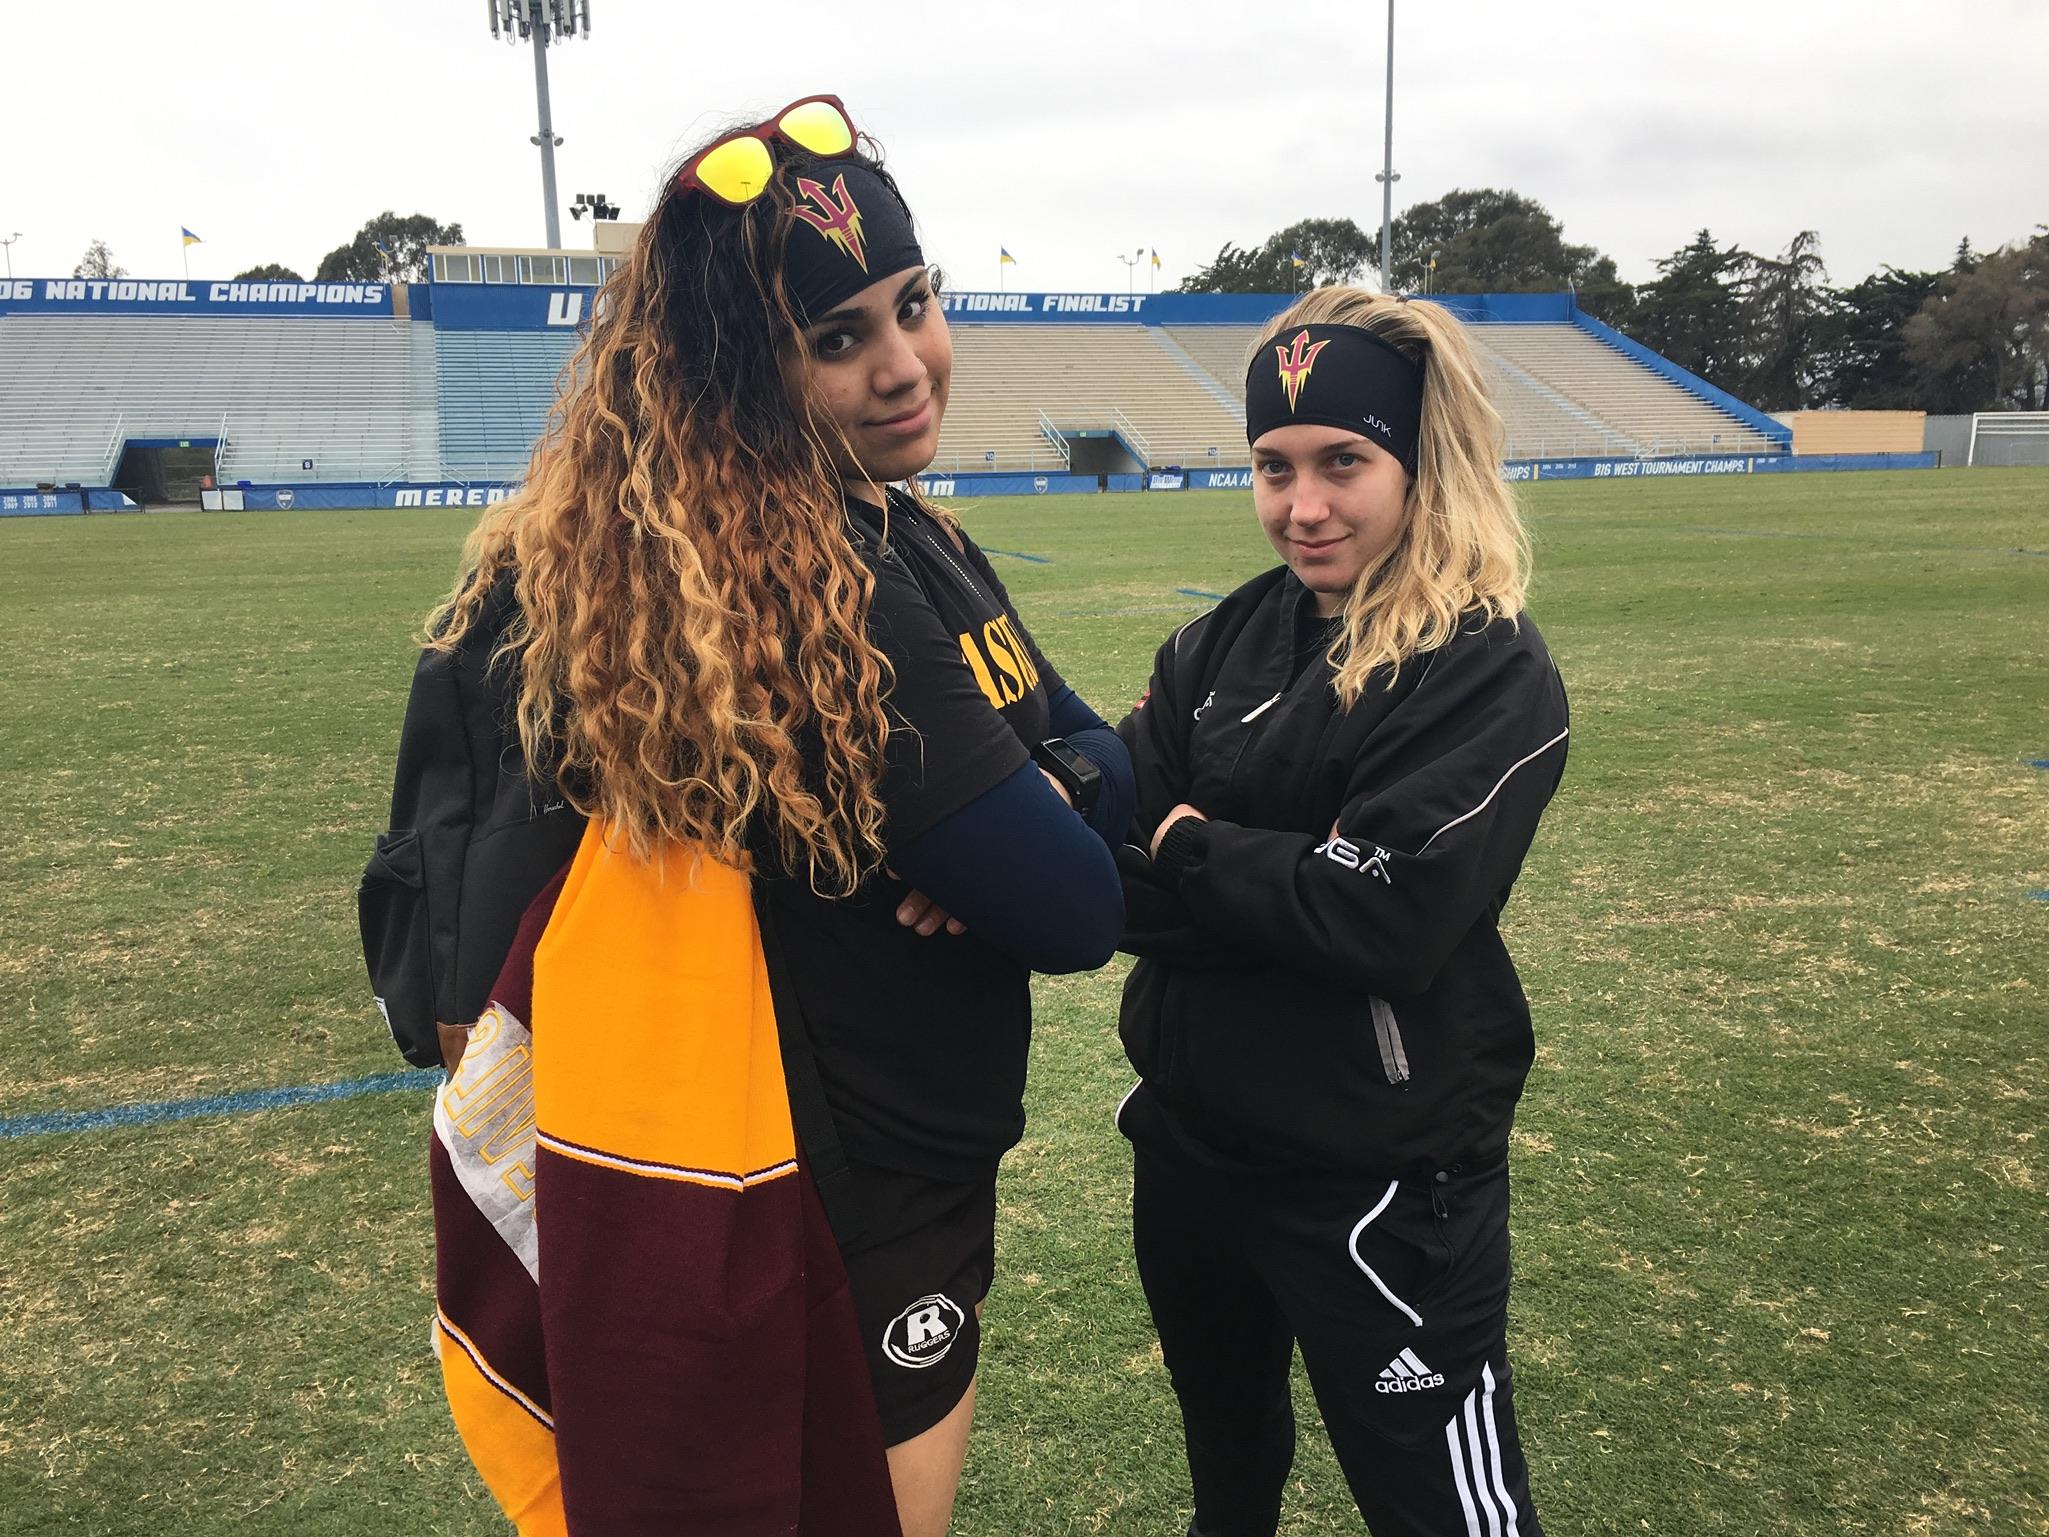 Arizona State University Women's D1 Rugby Team in their JUNK Headbands.